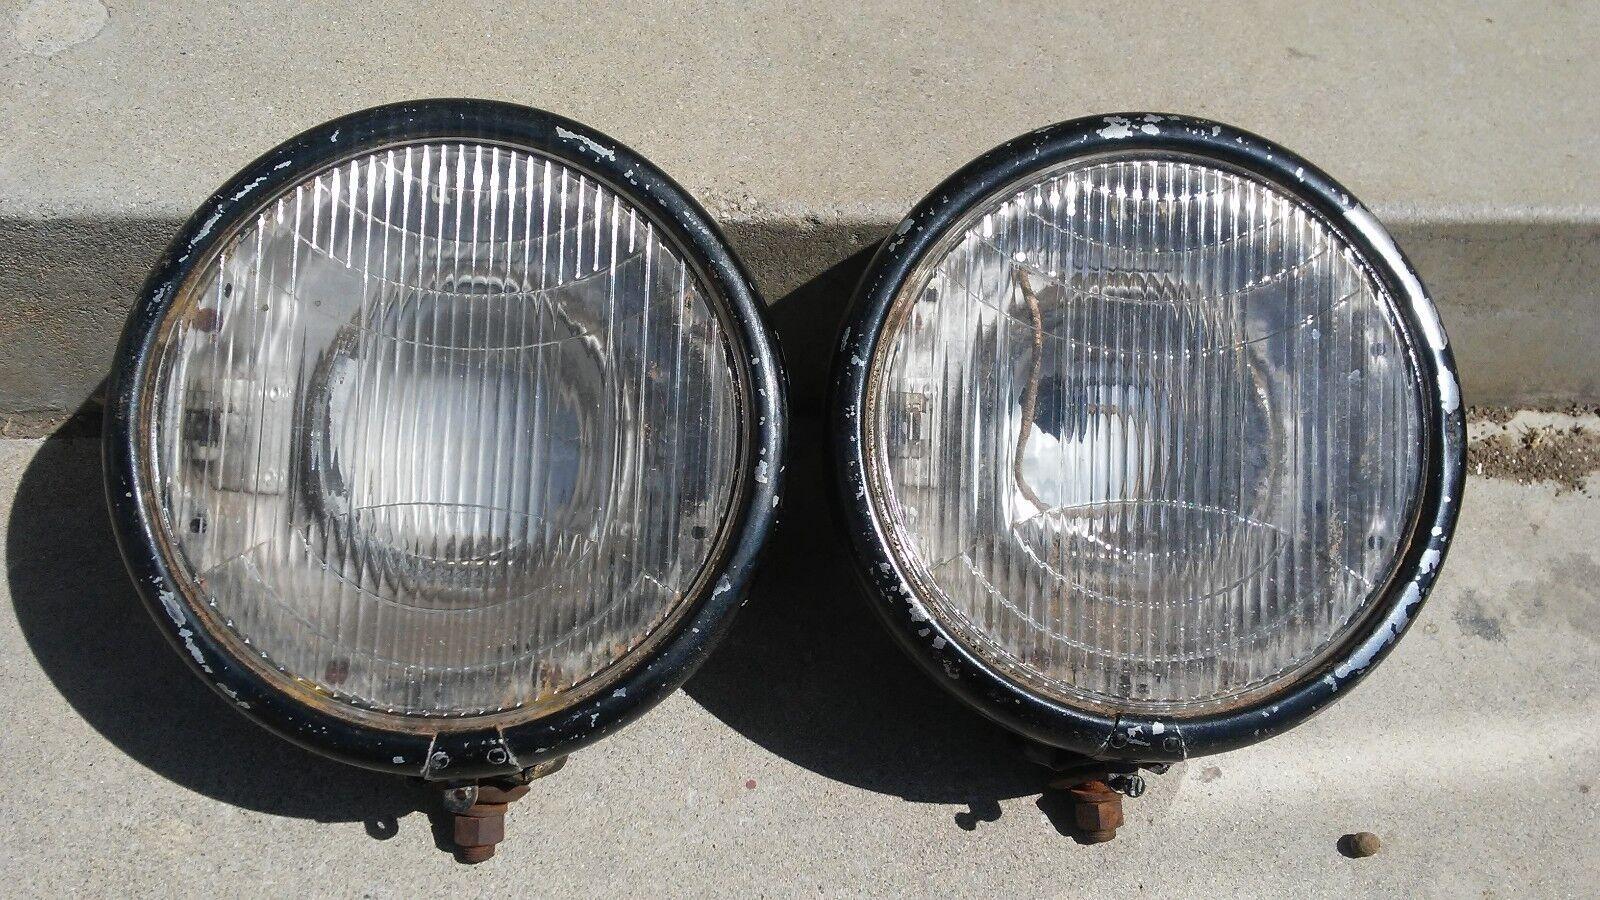 DURANT  GLOLITE  1930 - 1931  vintage head light BUCKETS